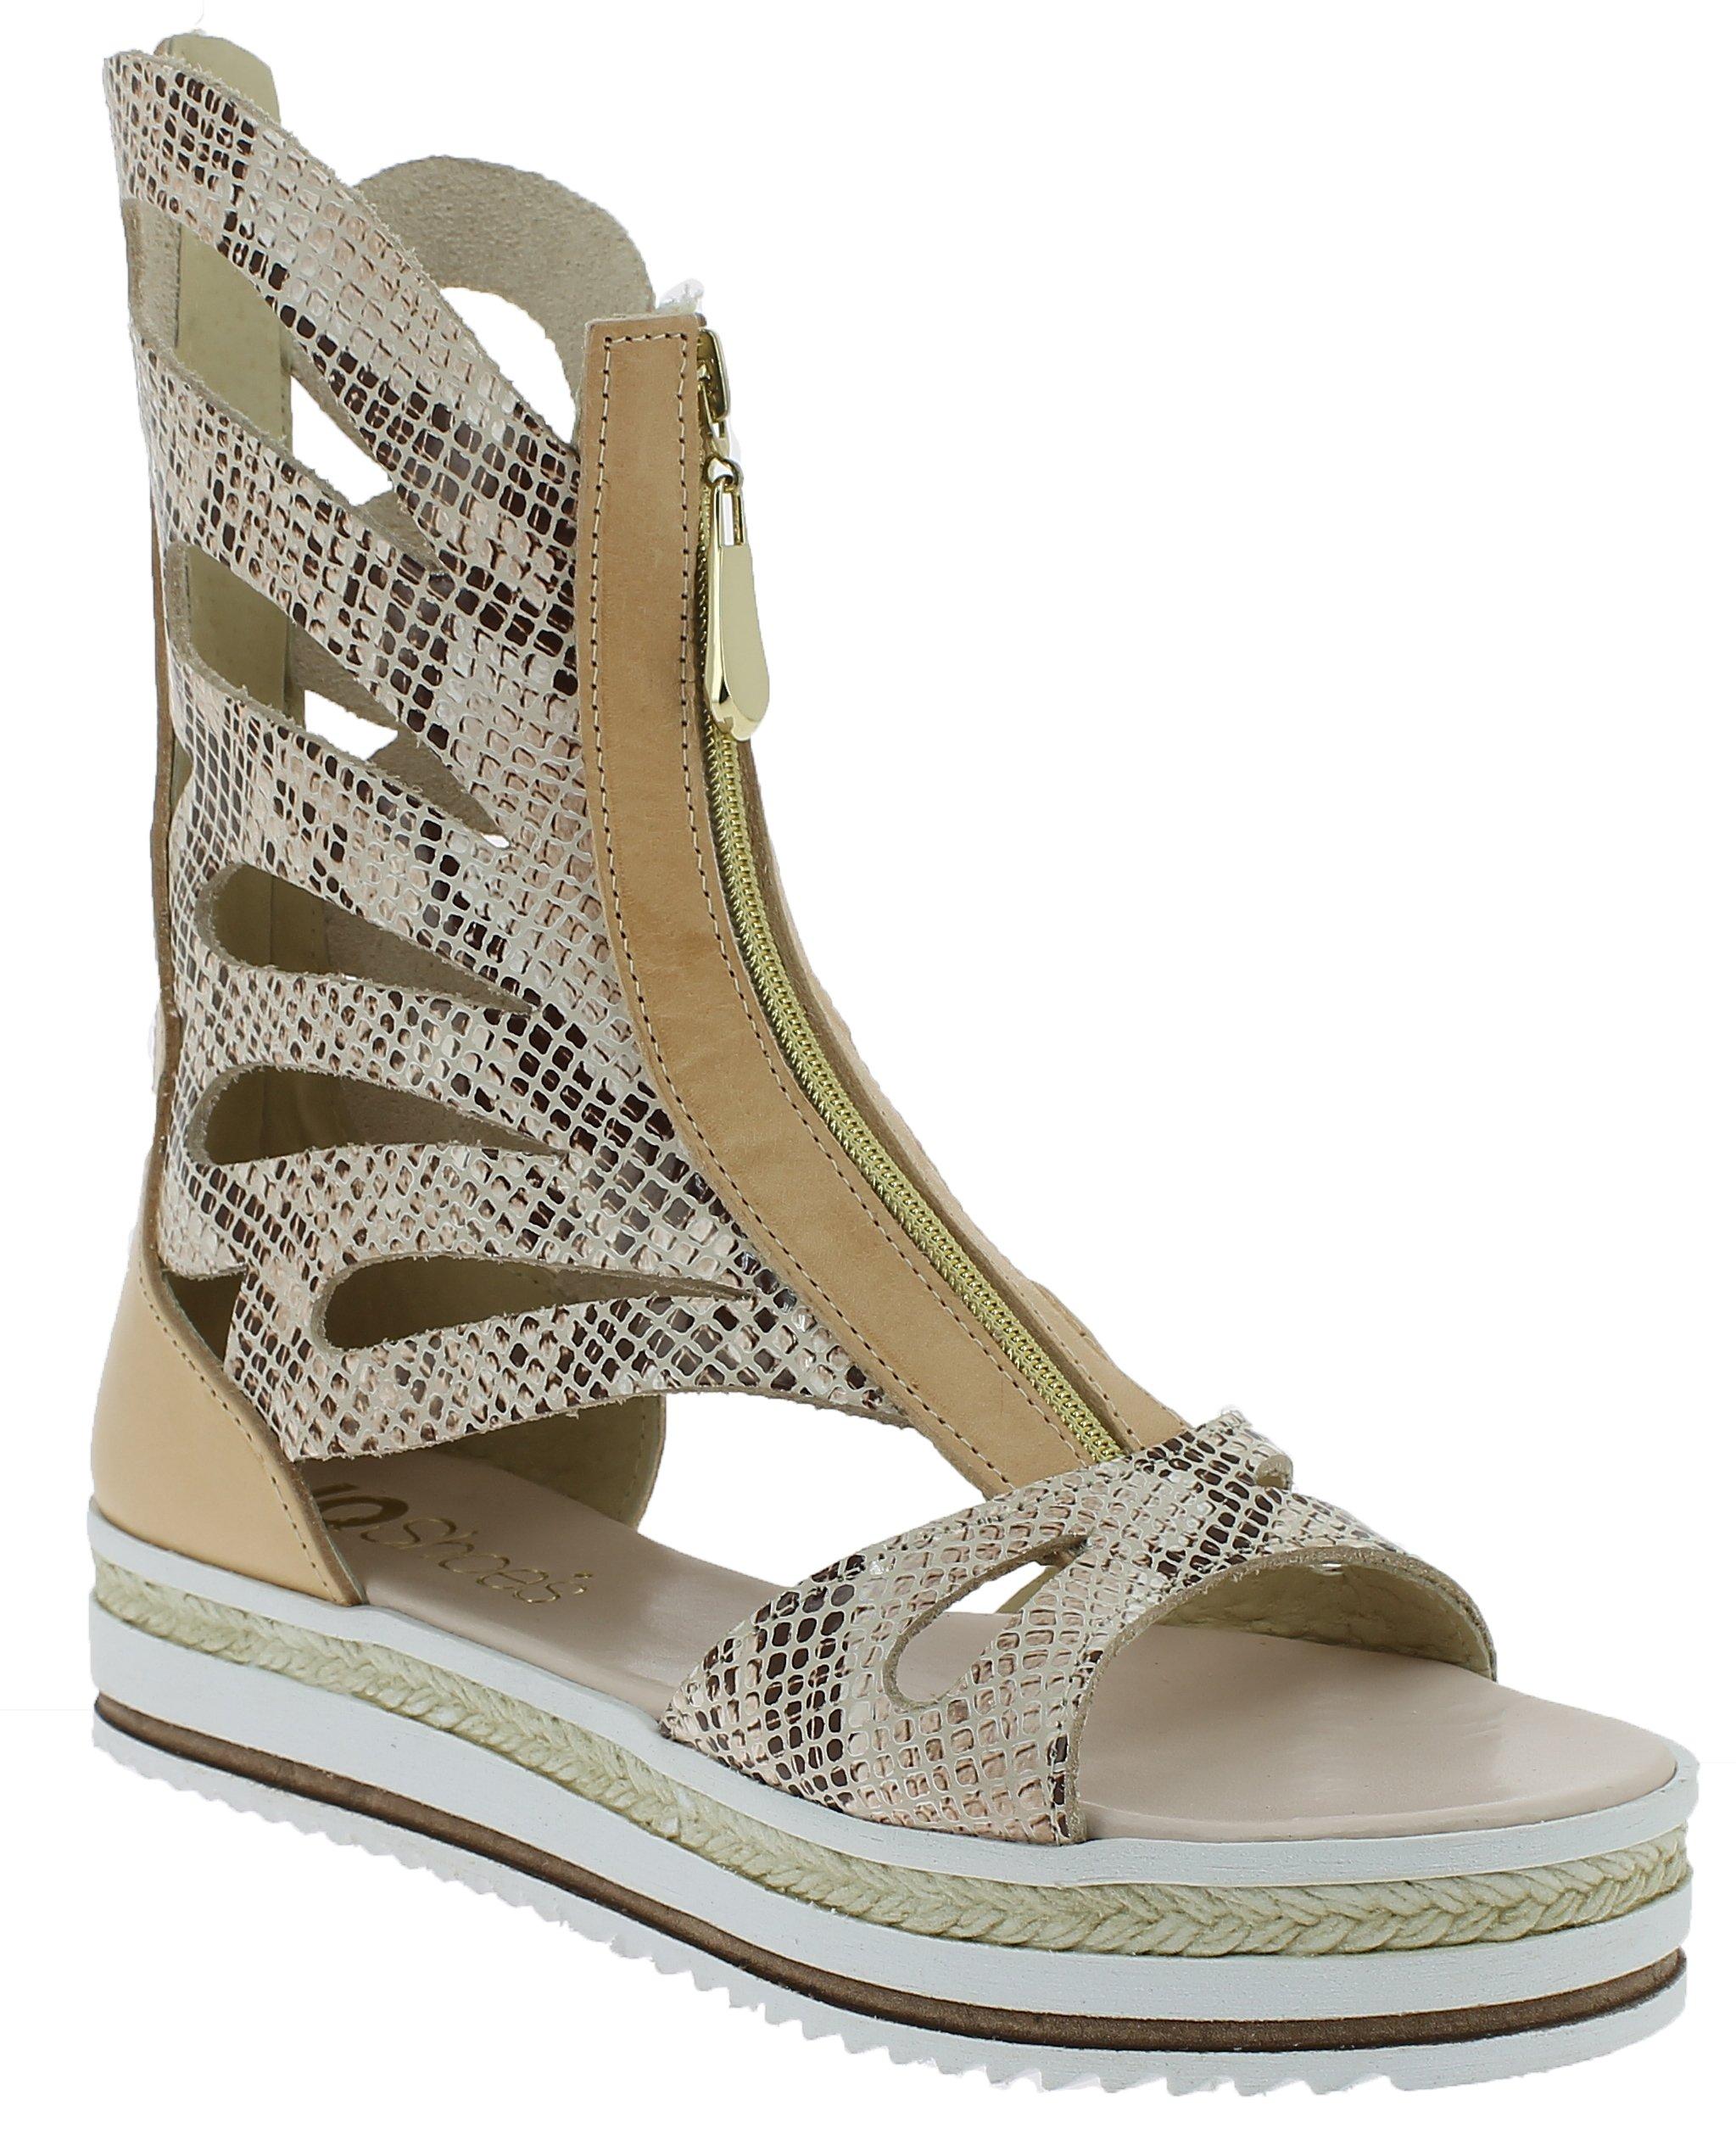 IQSHOES Γυναικείο Πέδιλο B23T Μπεζ - IqShoes - 50.B23T BEIGE-IQSHOES-beige-38/1/ παπούτσια  προσφορεσ